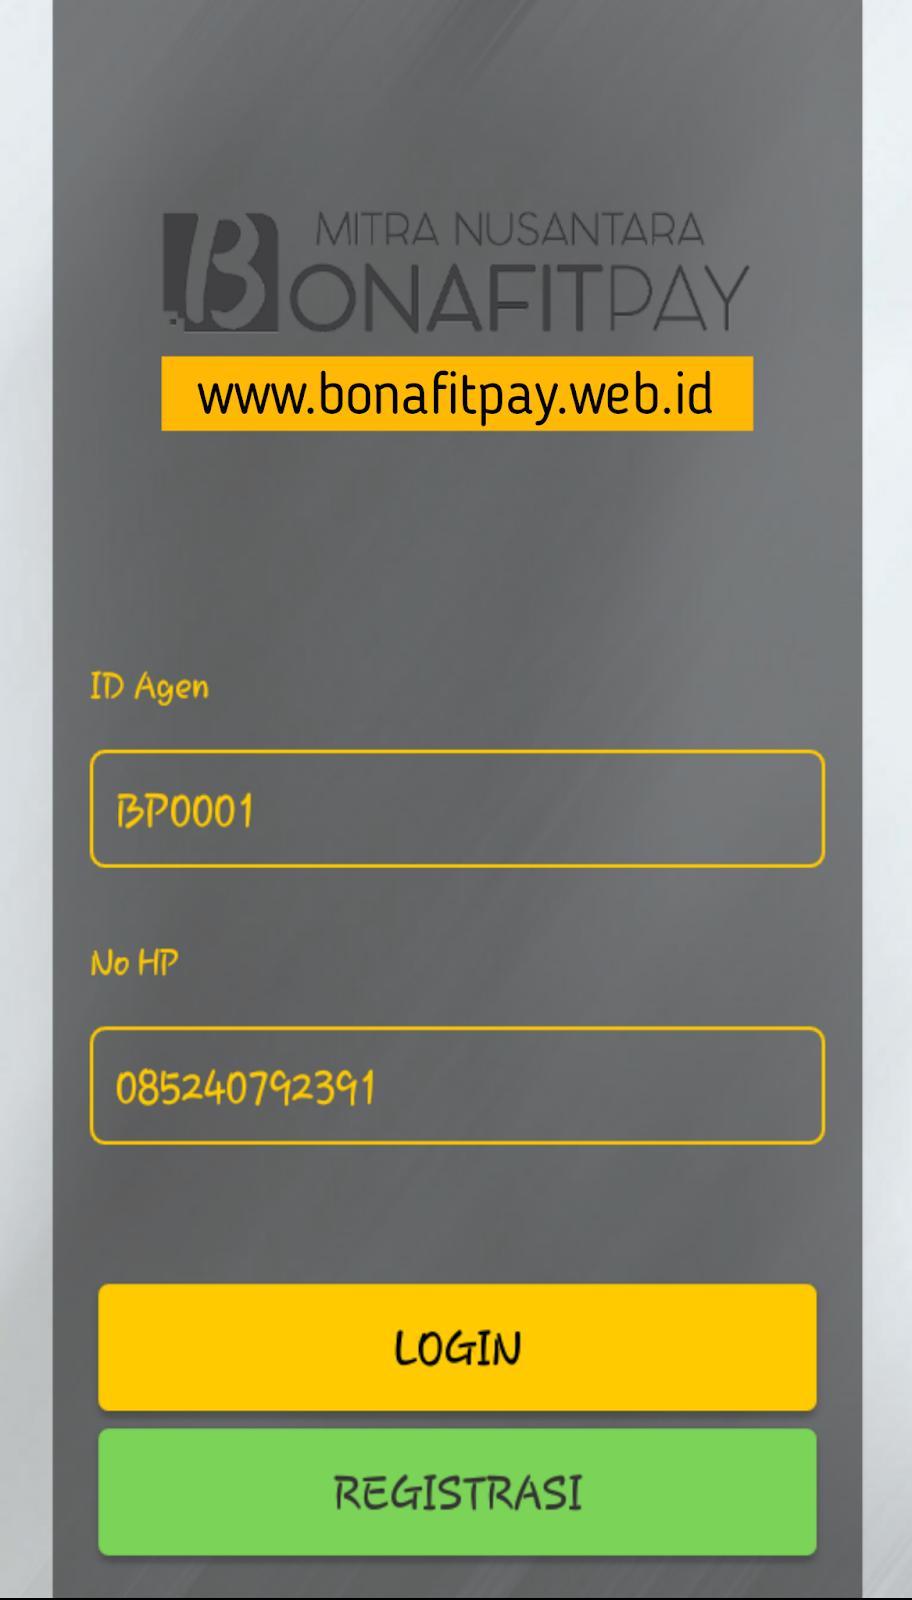 Bonafitpay